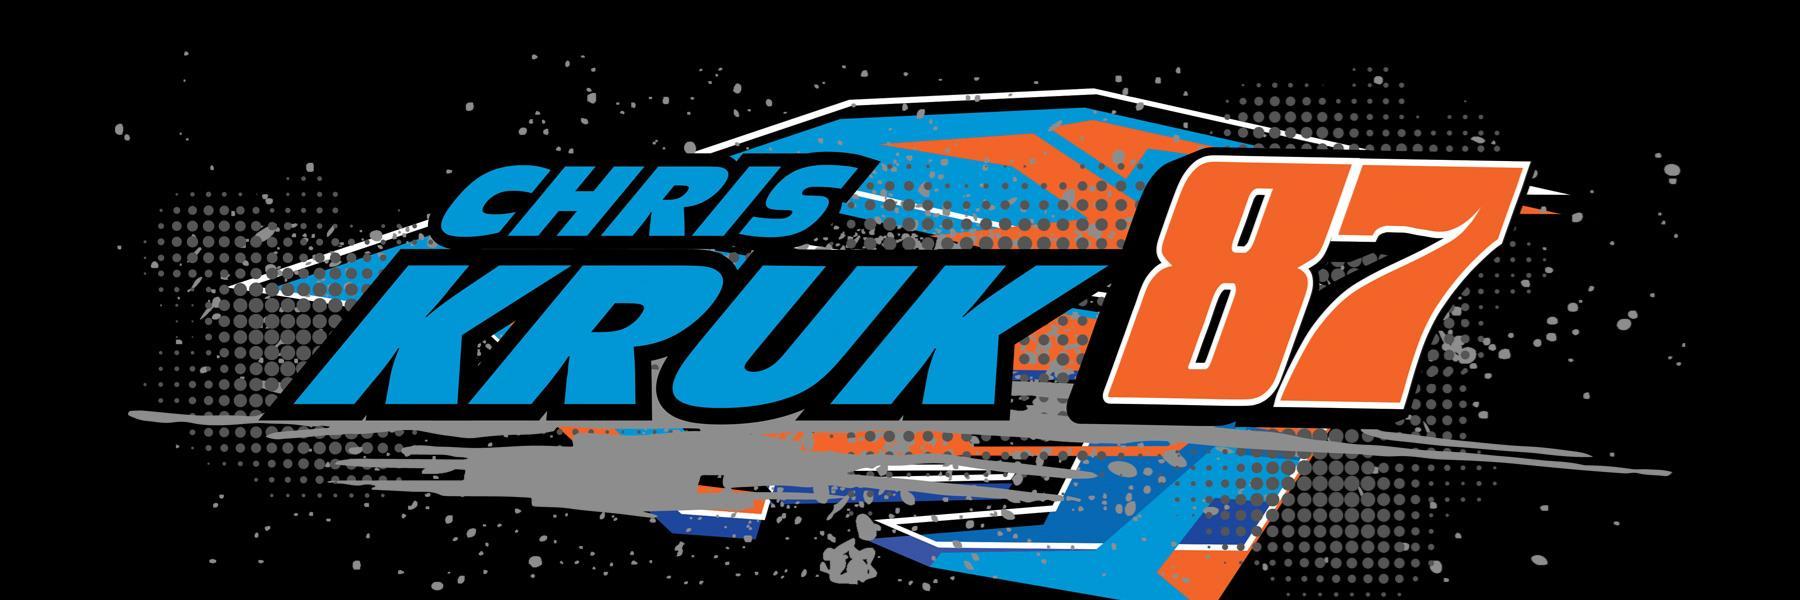 Chris Kruk